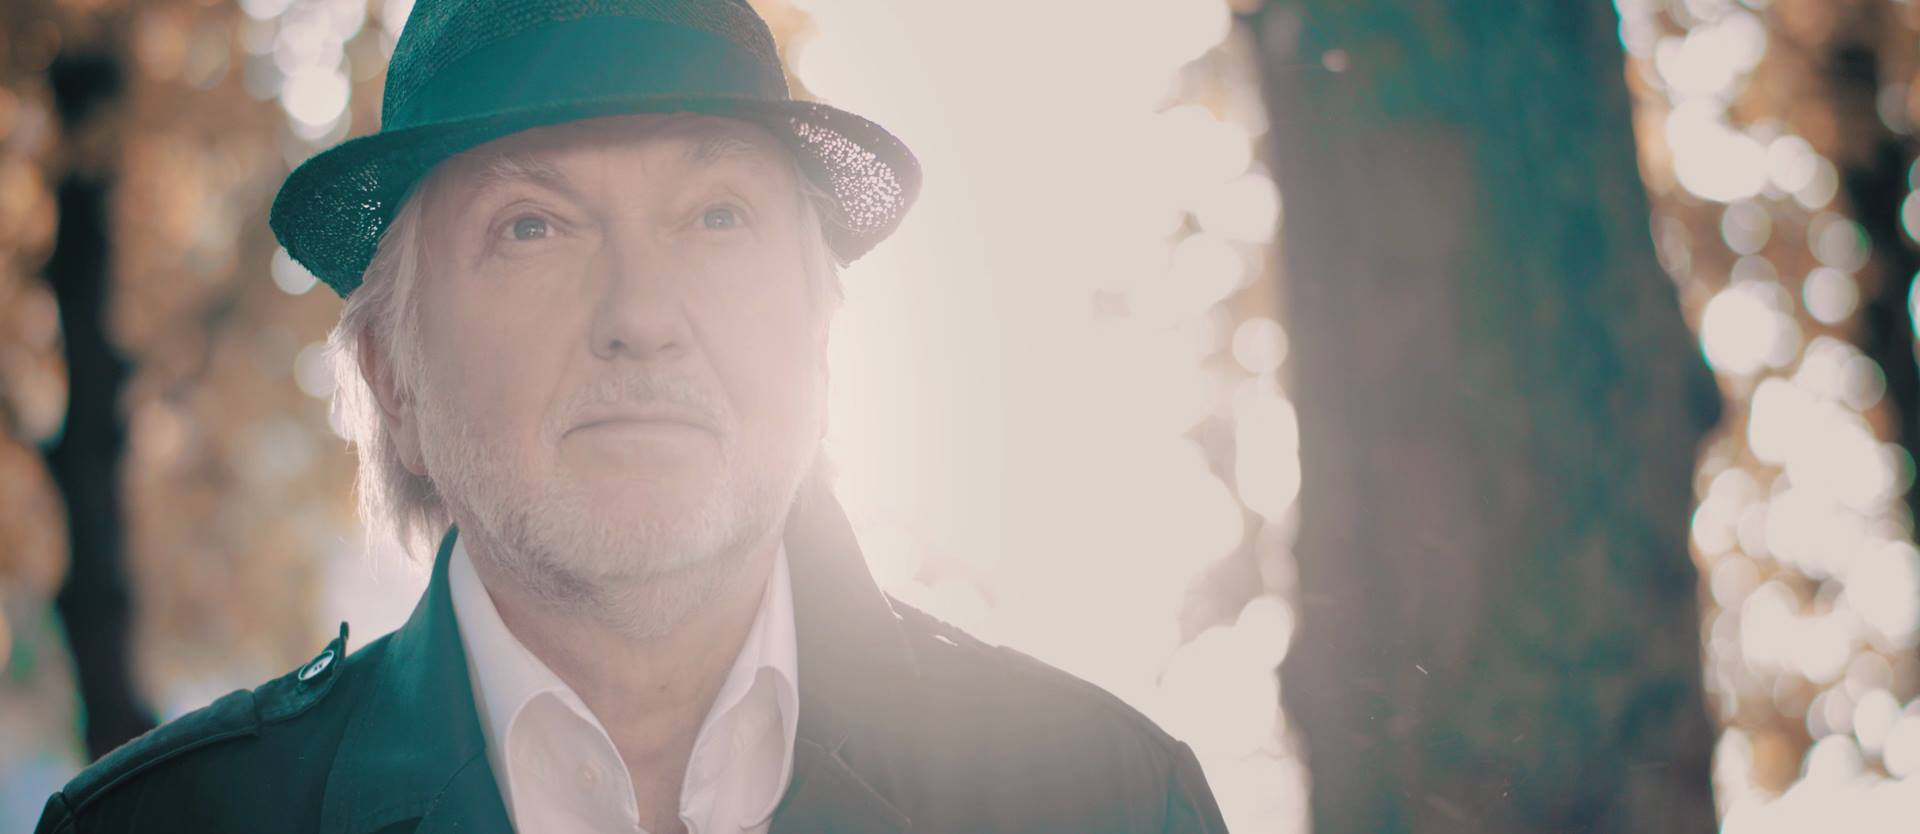 Joachim Witt Lebe dein Leben Musikvideo Promi Big Brother